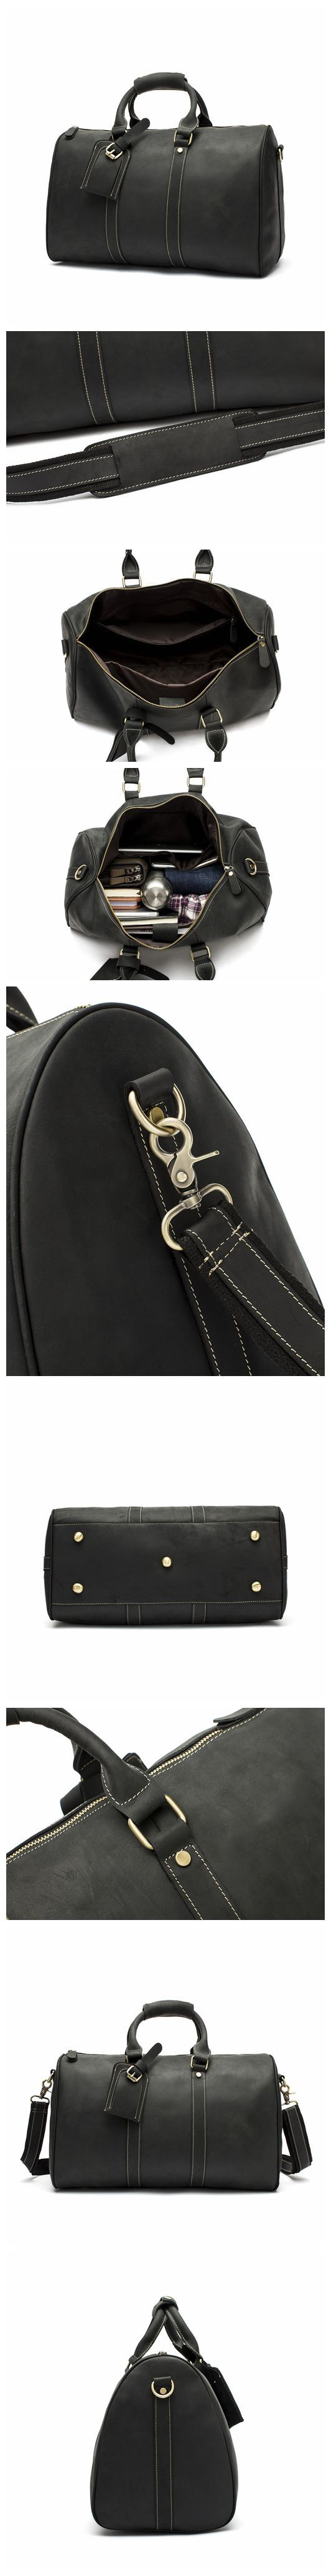 Handmade Leather Wearable Travel Bag, Large Capacity Men's Gym Bag, Duffle Bag 12026